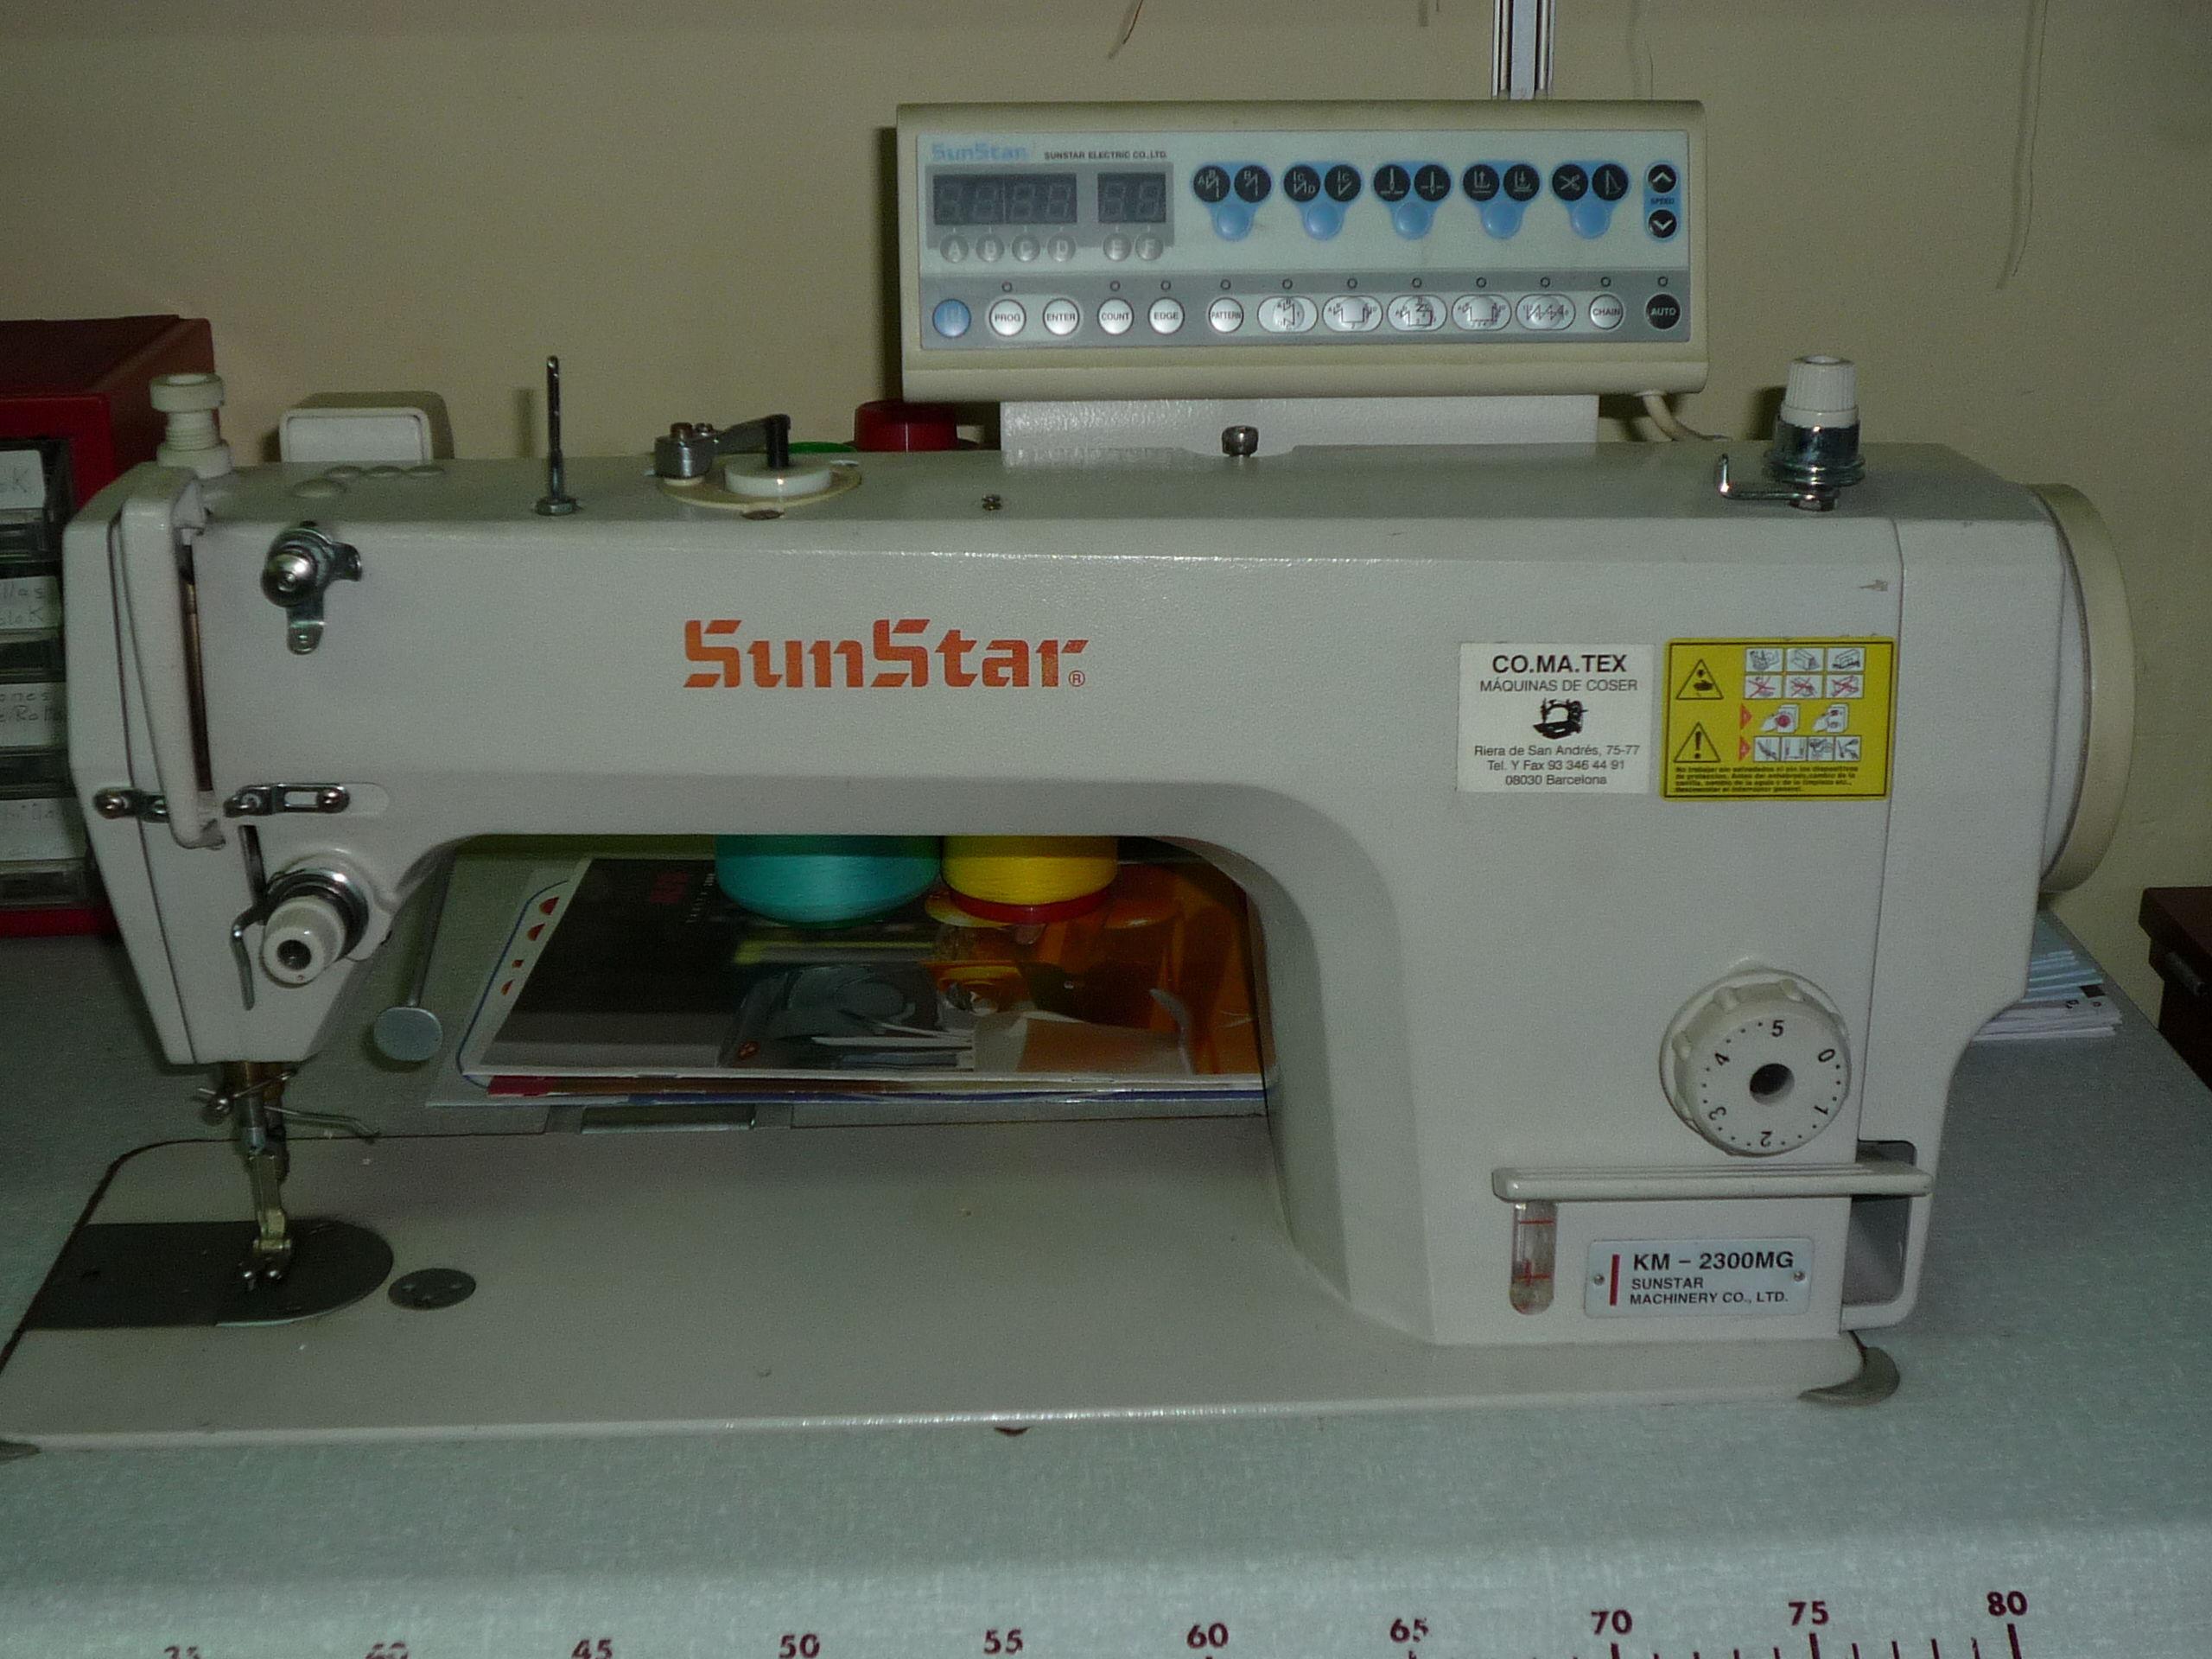 Venta máquina industrial Sunstar mod.KM-2300 MG, Barcelona